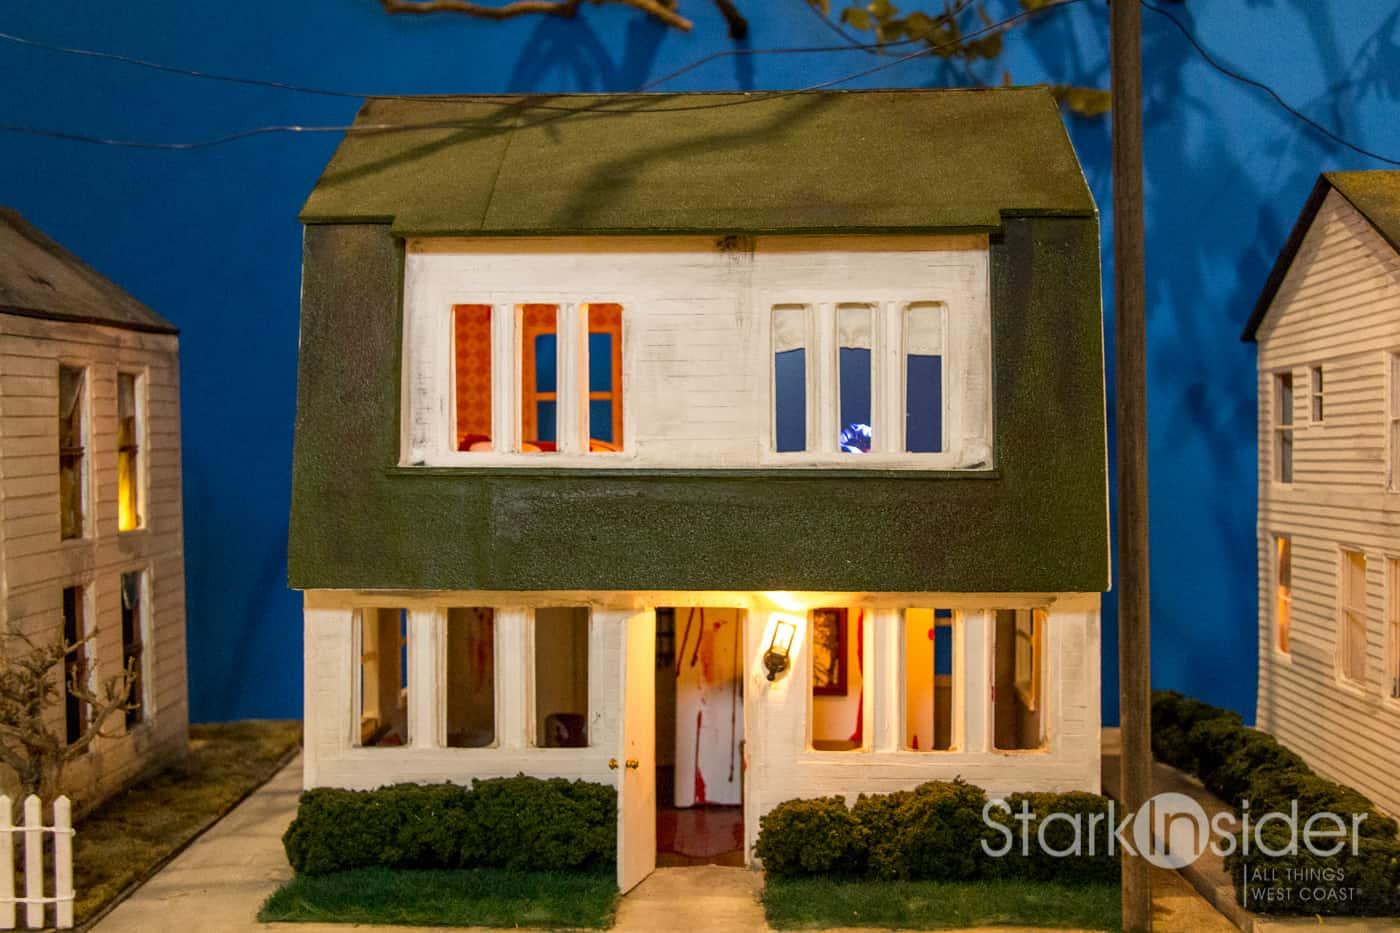 Nightmare on elm street house images